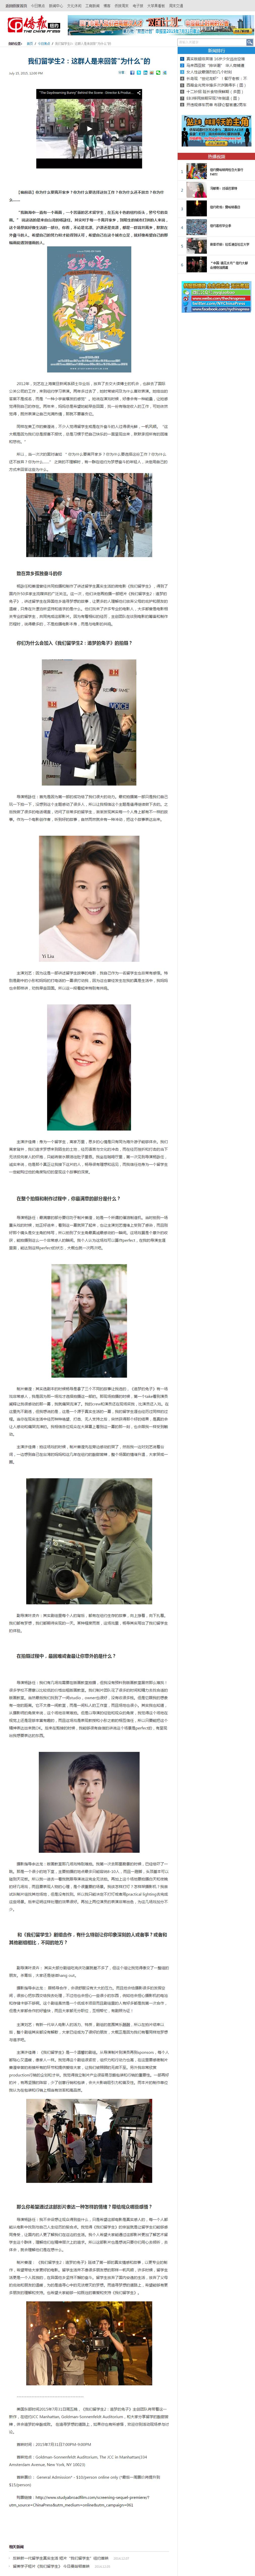 US China Press_7.15.15 Report